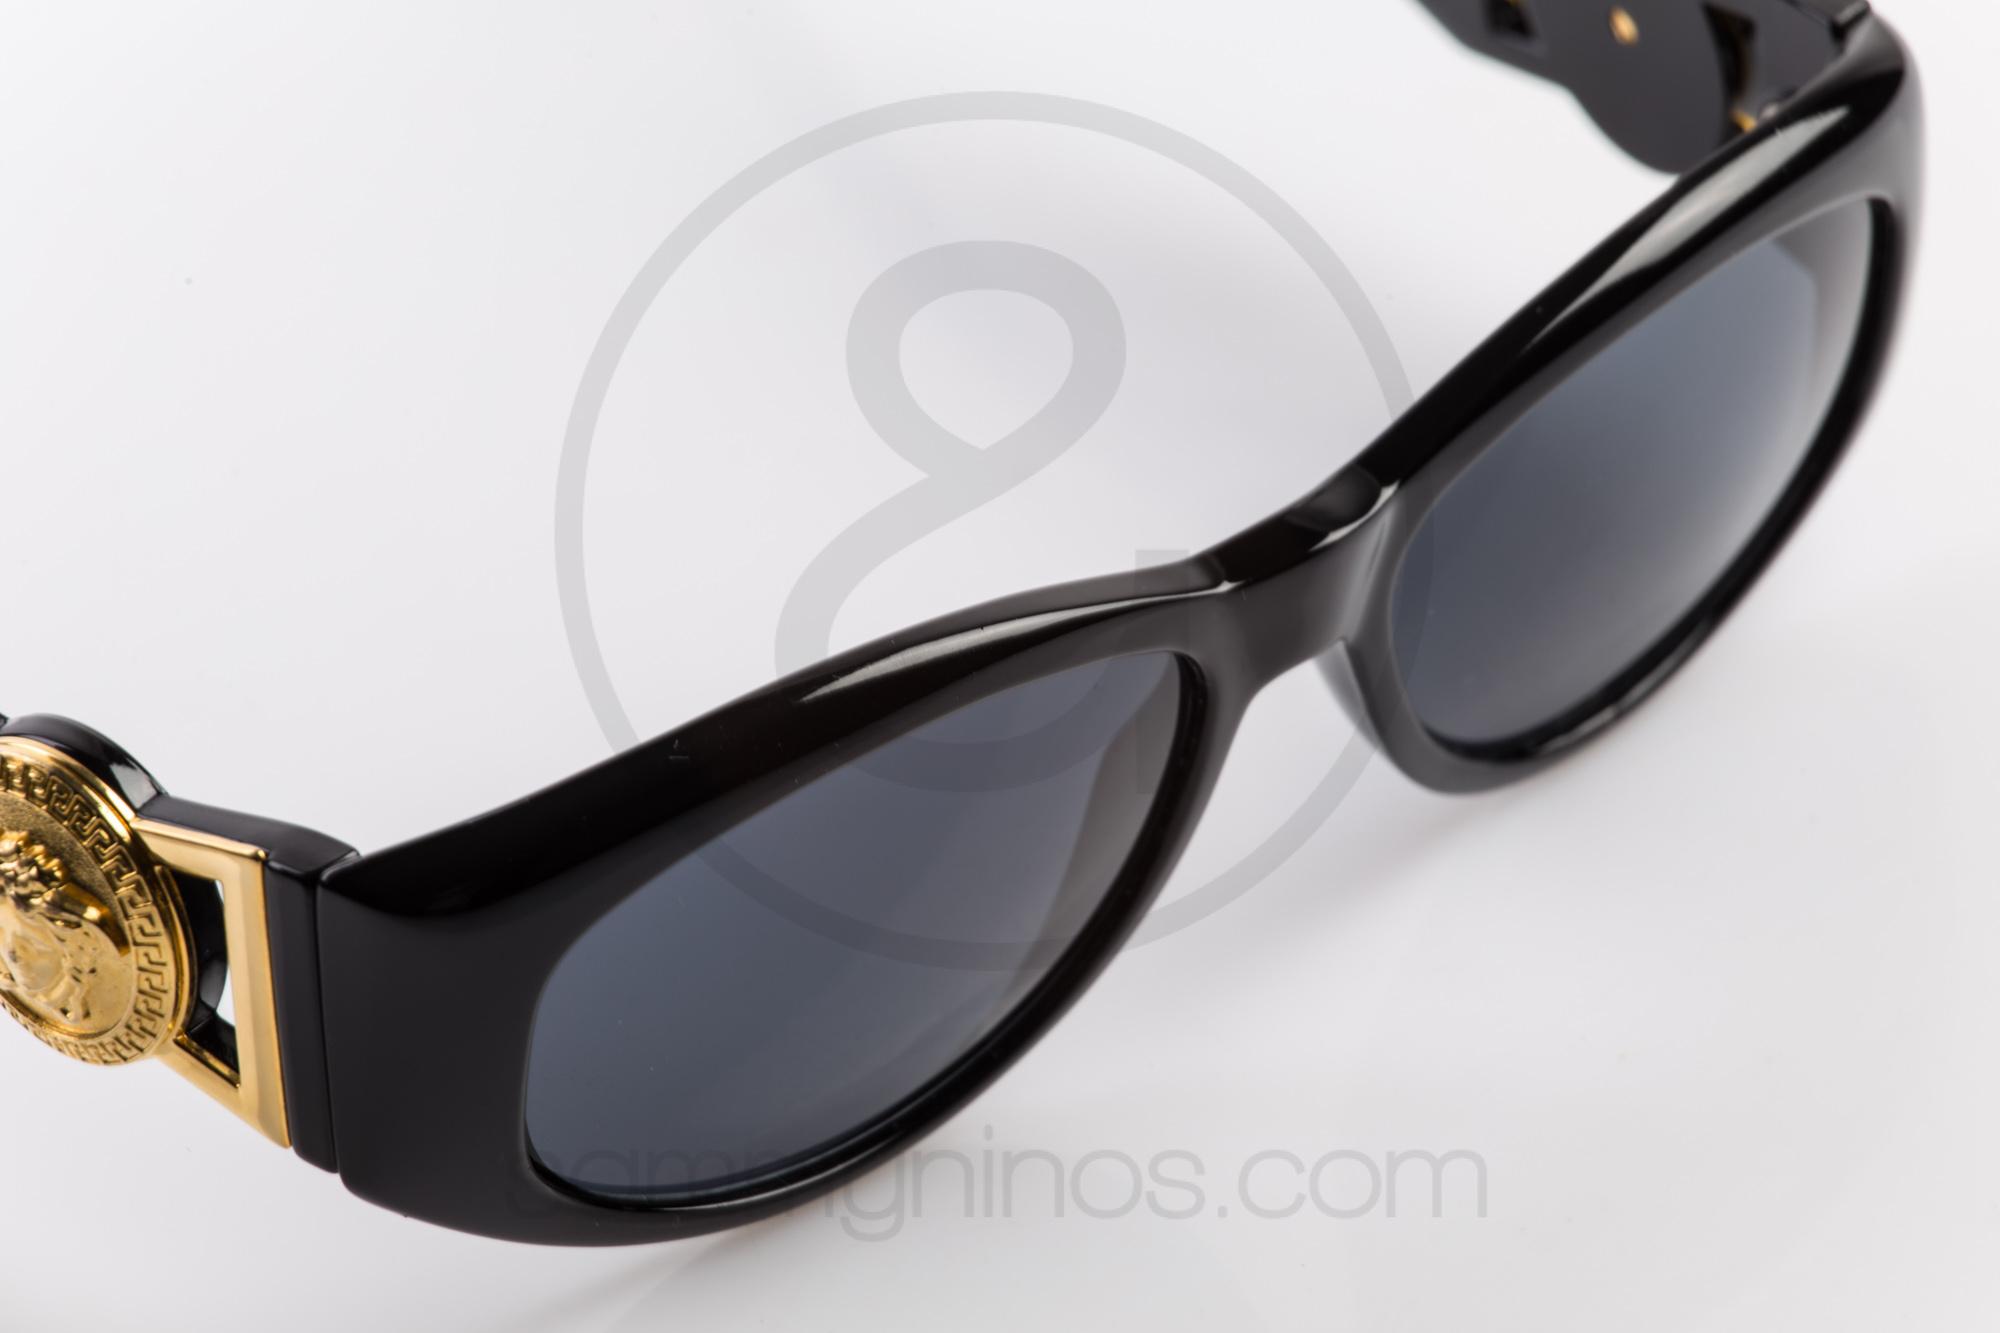 222e5e2a757 Gianni Versace Sunglasses Vintage